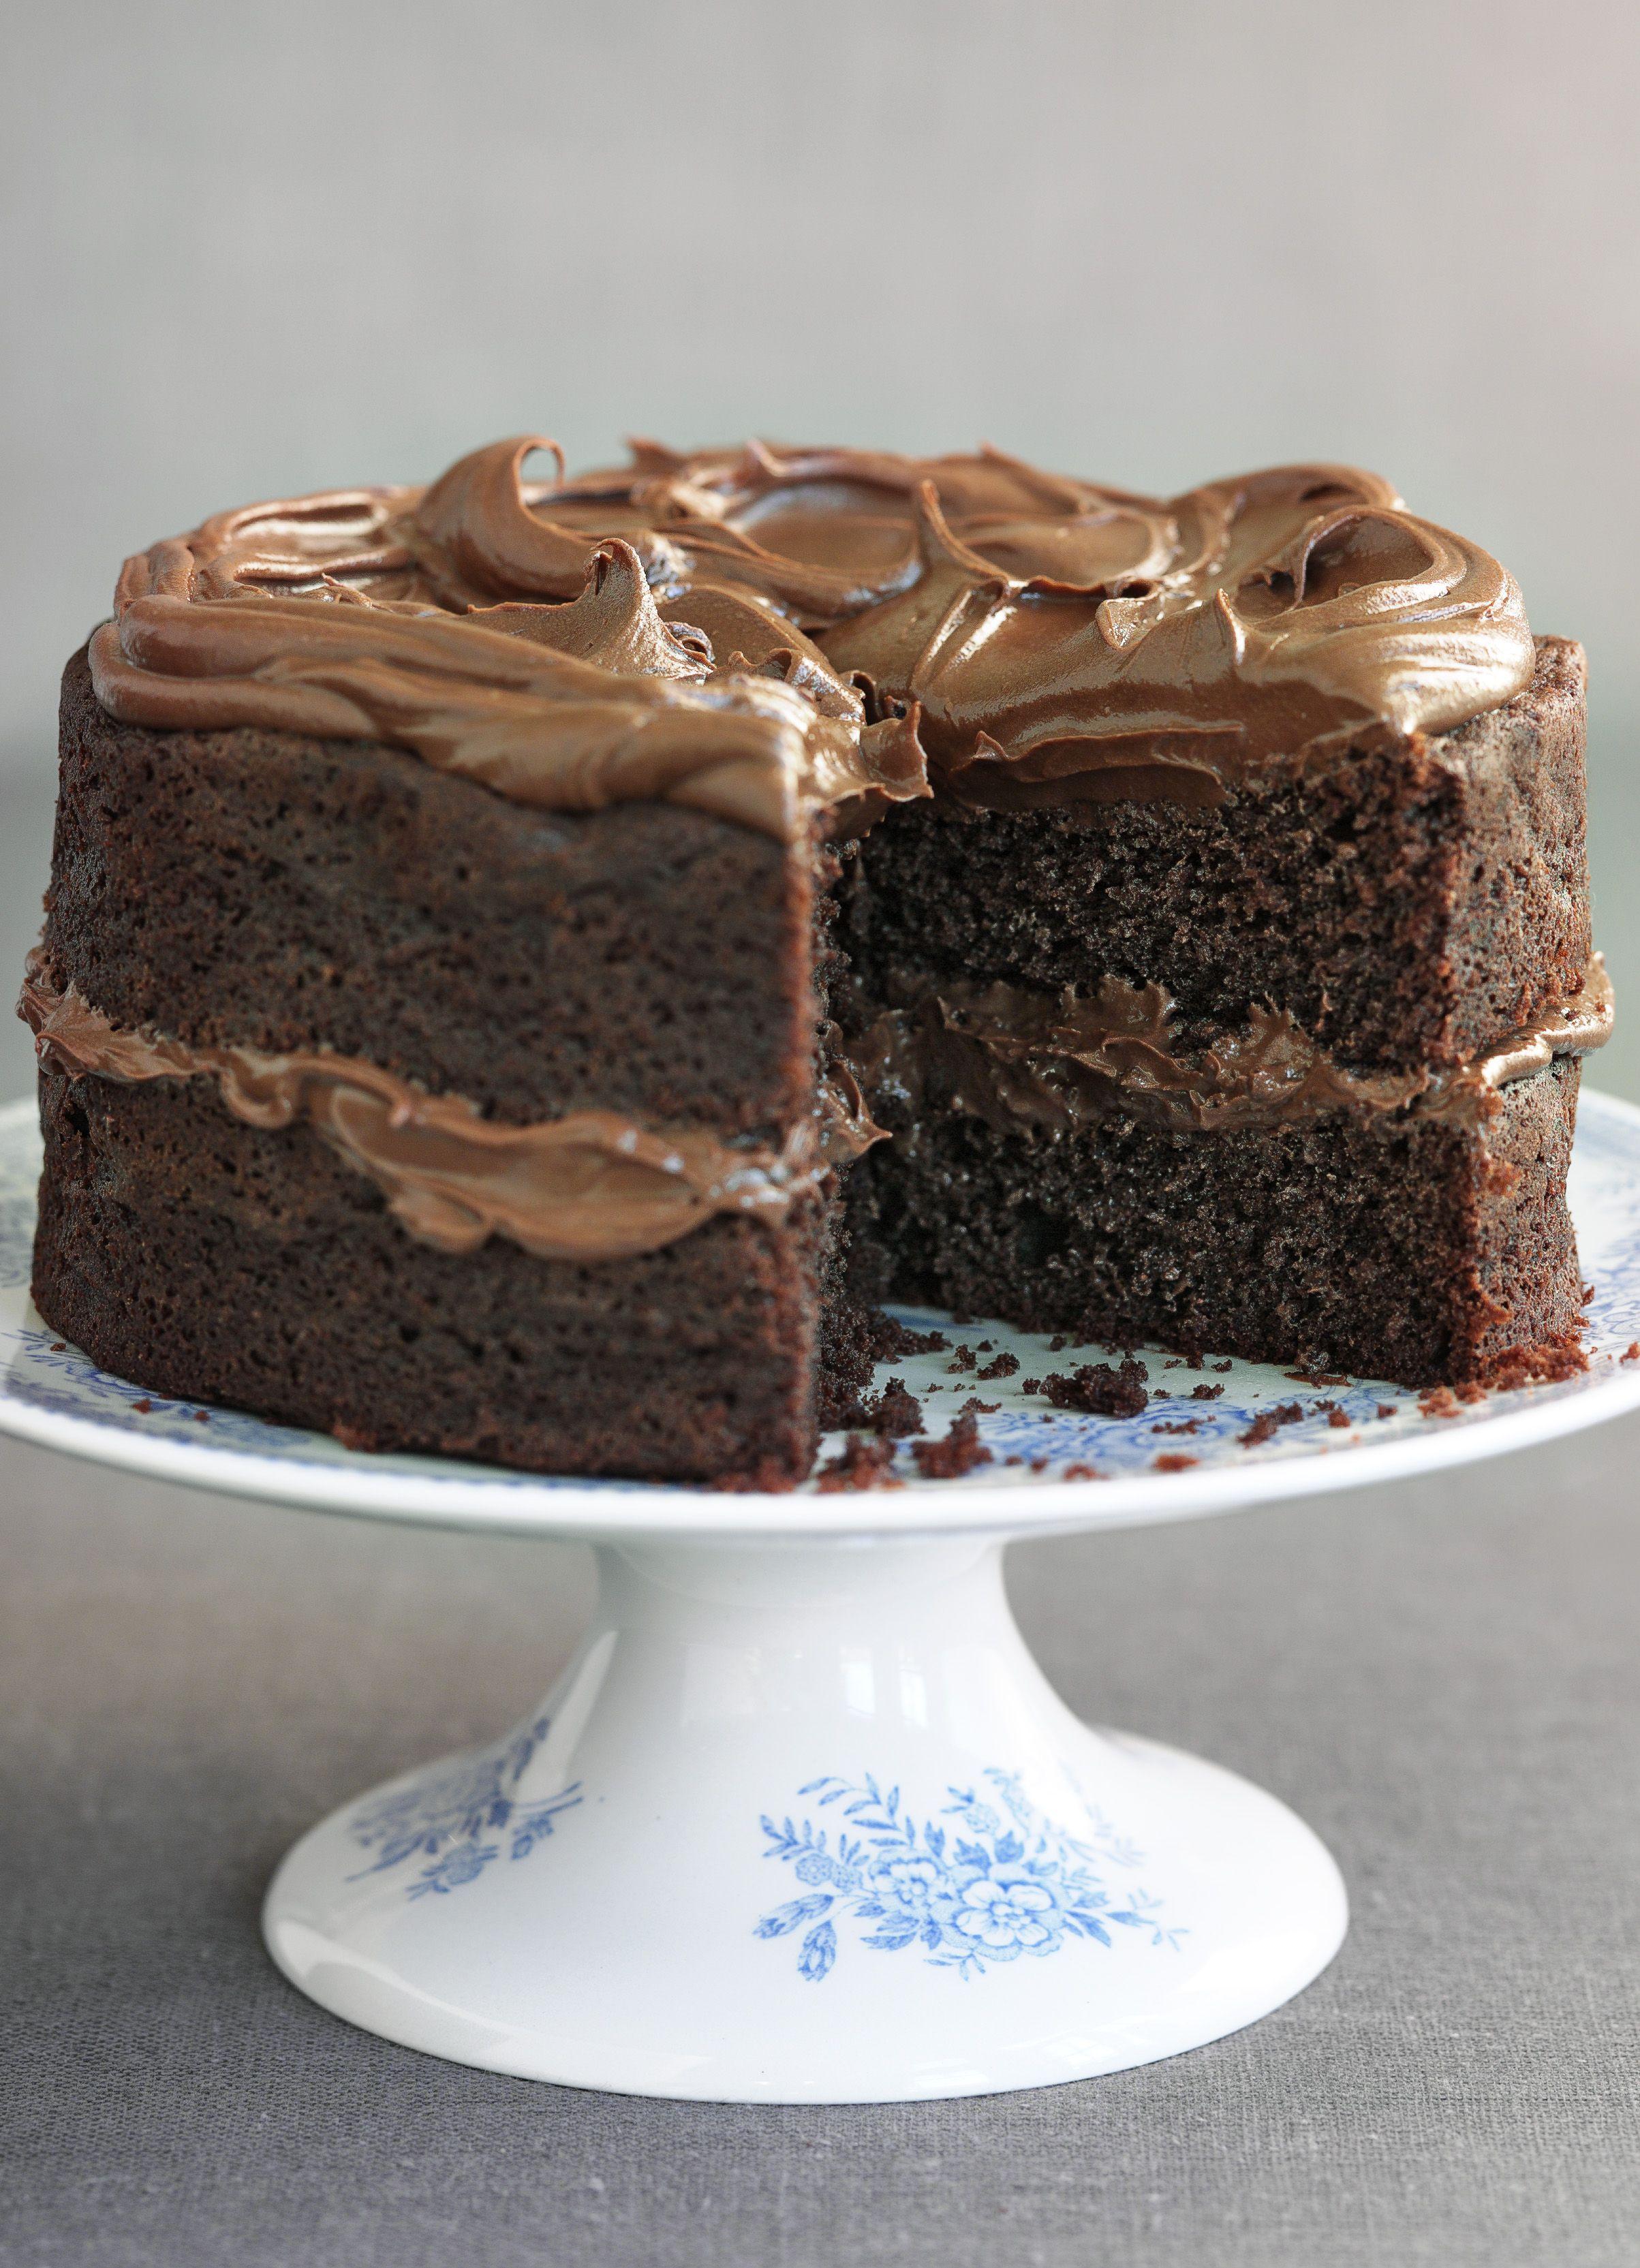 Easiest ever chocolate fudge cake | Chocolate fudge cake ...